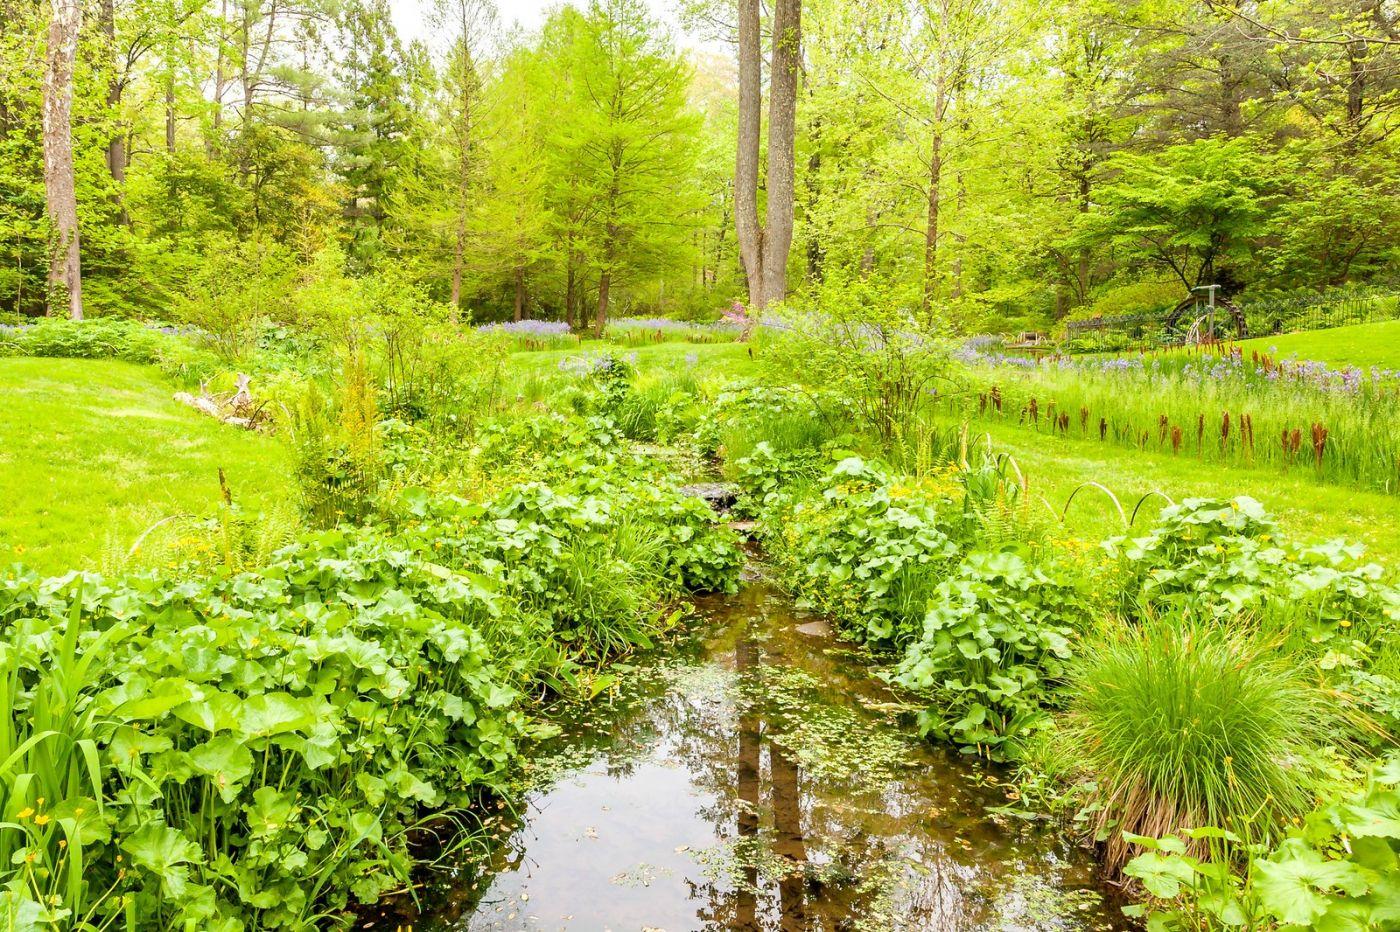 Chanticleer花园,融入自然_图1-21